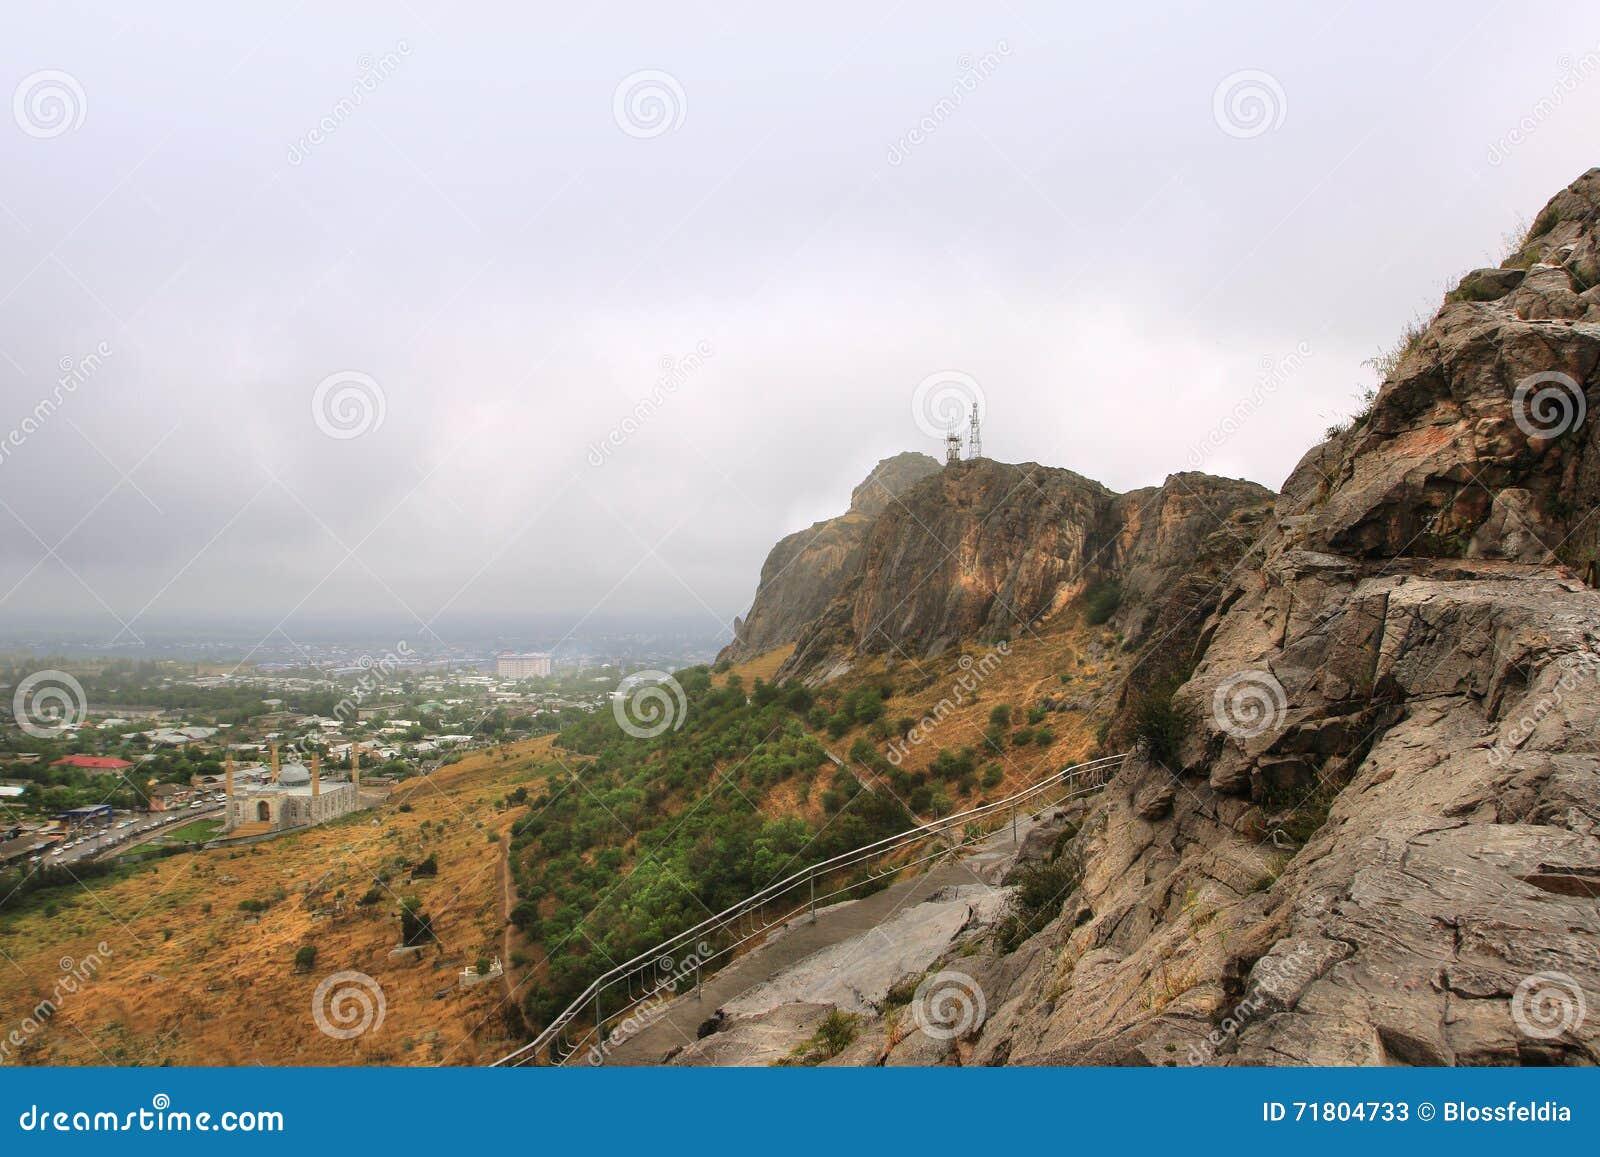 Sulayman гора слишком и Sulayman мечеть на предпосылке, Кыргызстан слишком